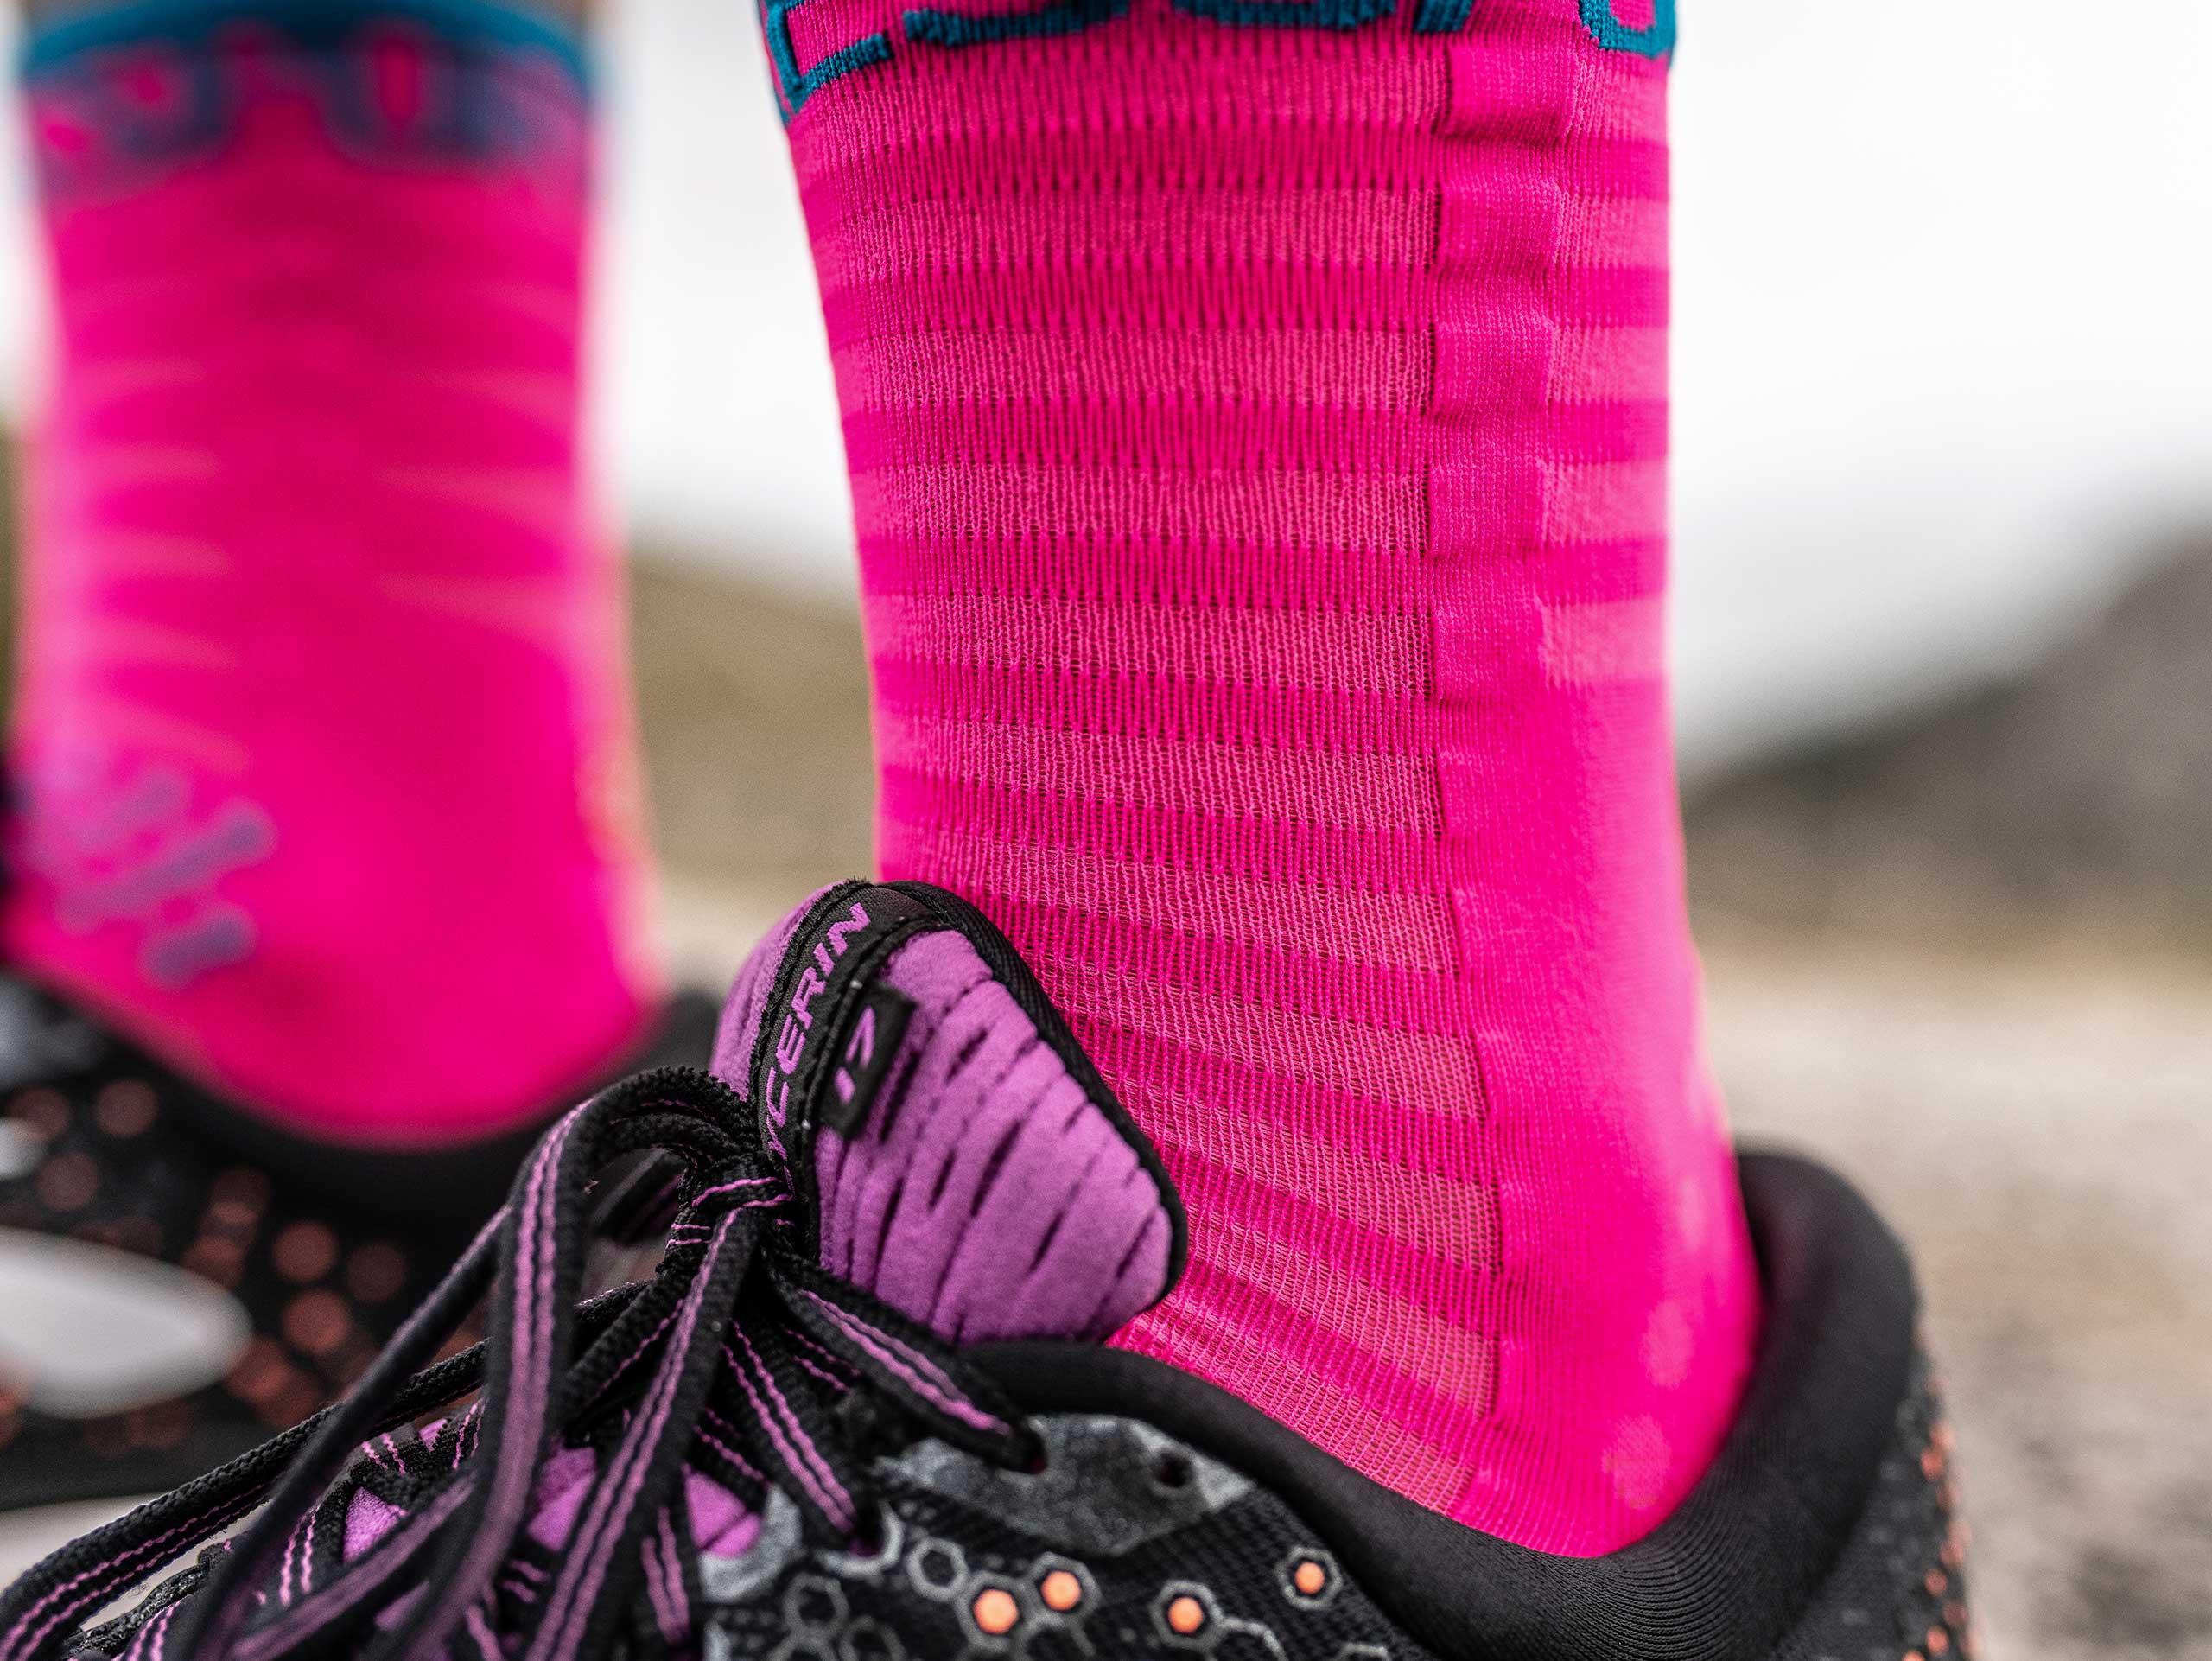 Pro Racing Socks v3.0 Ultralight Run High Neonpink